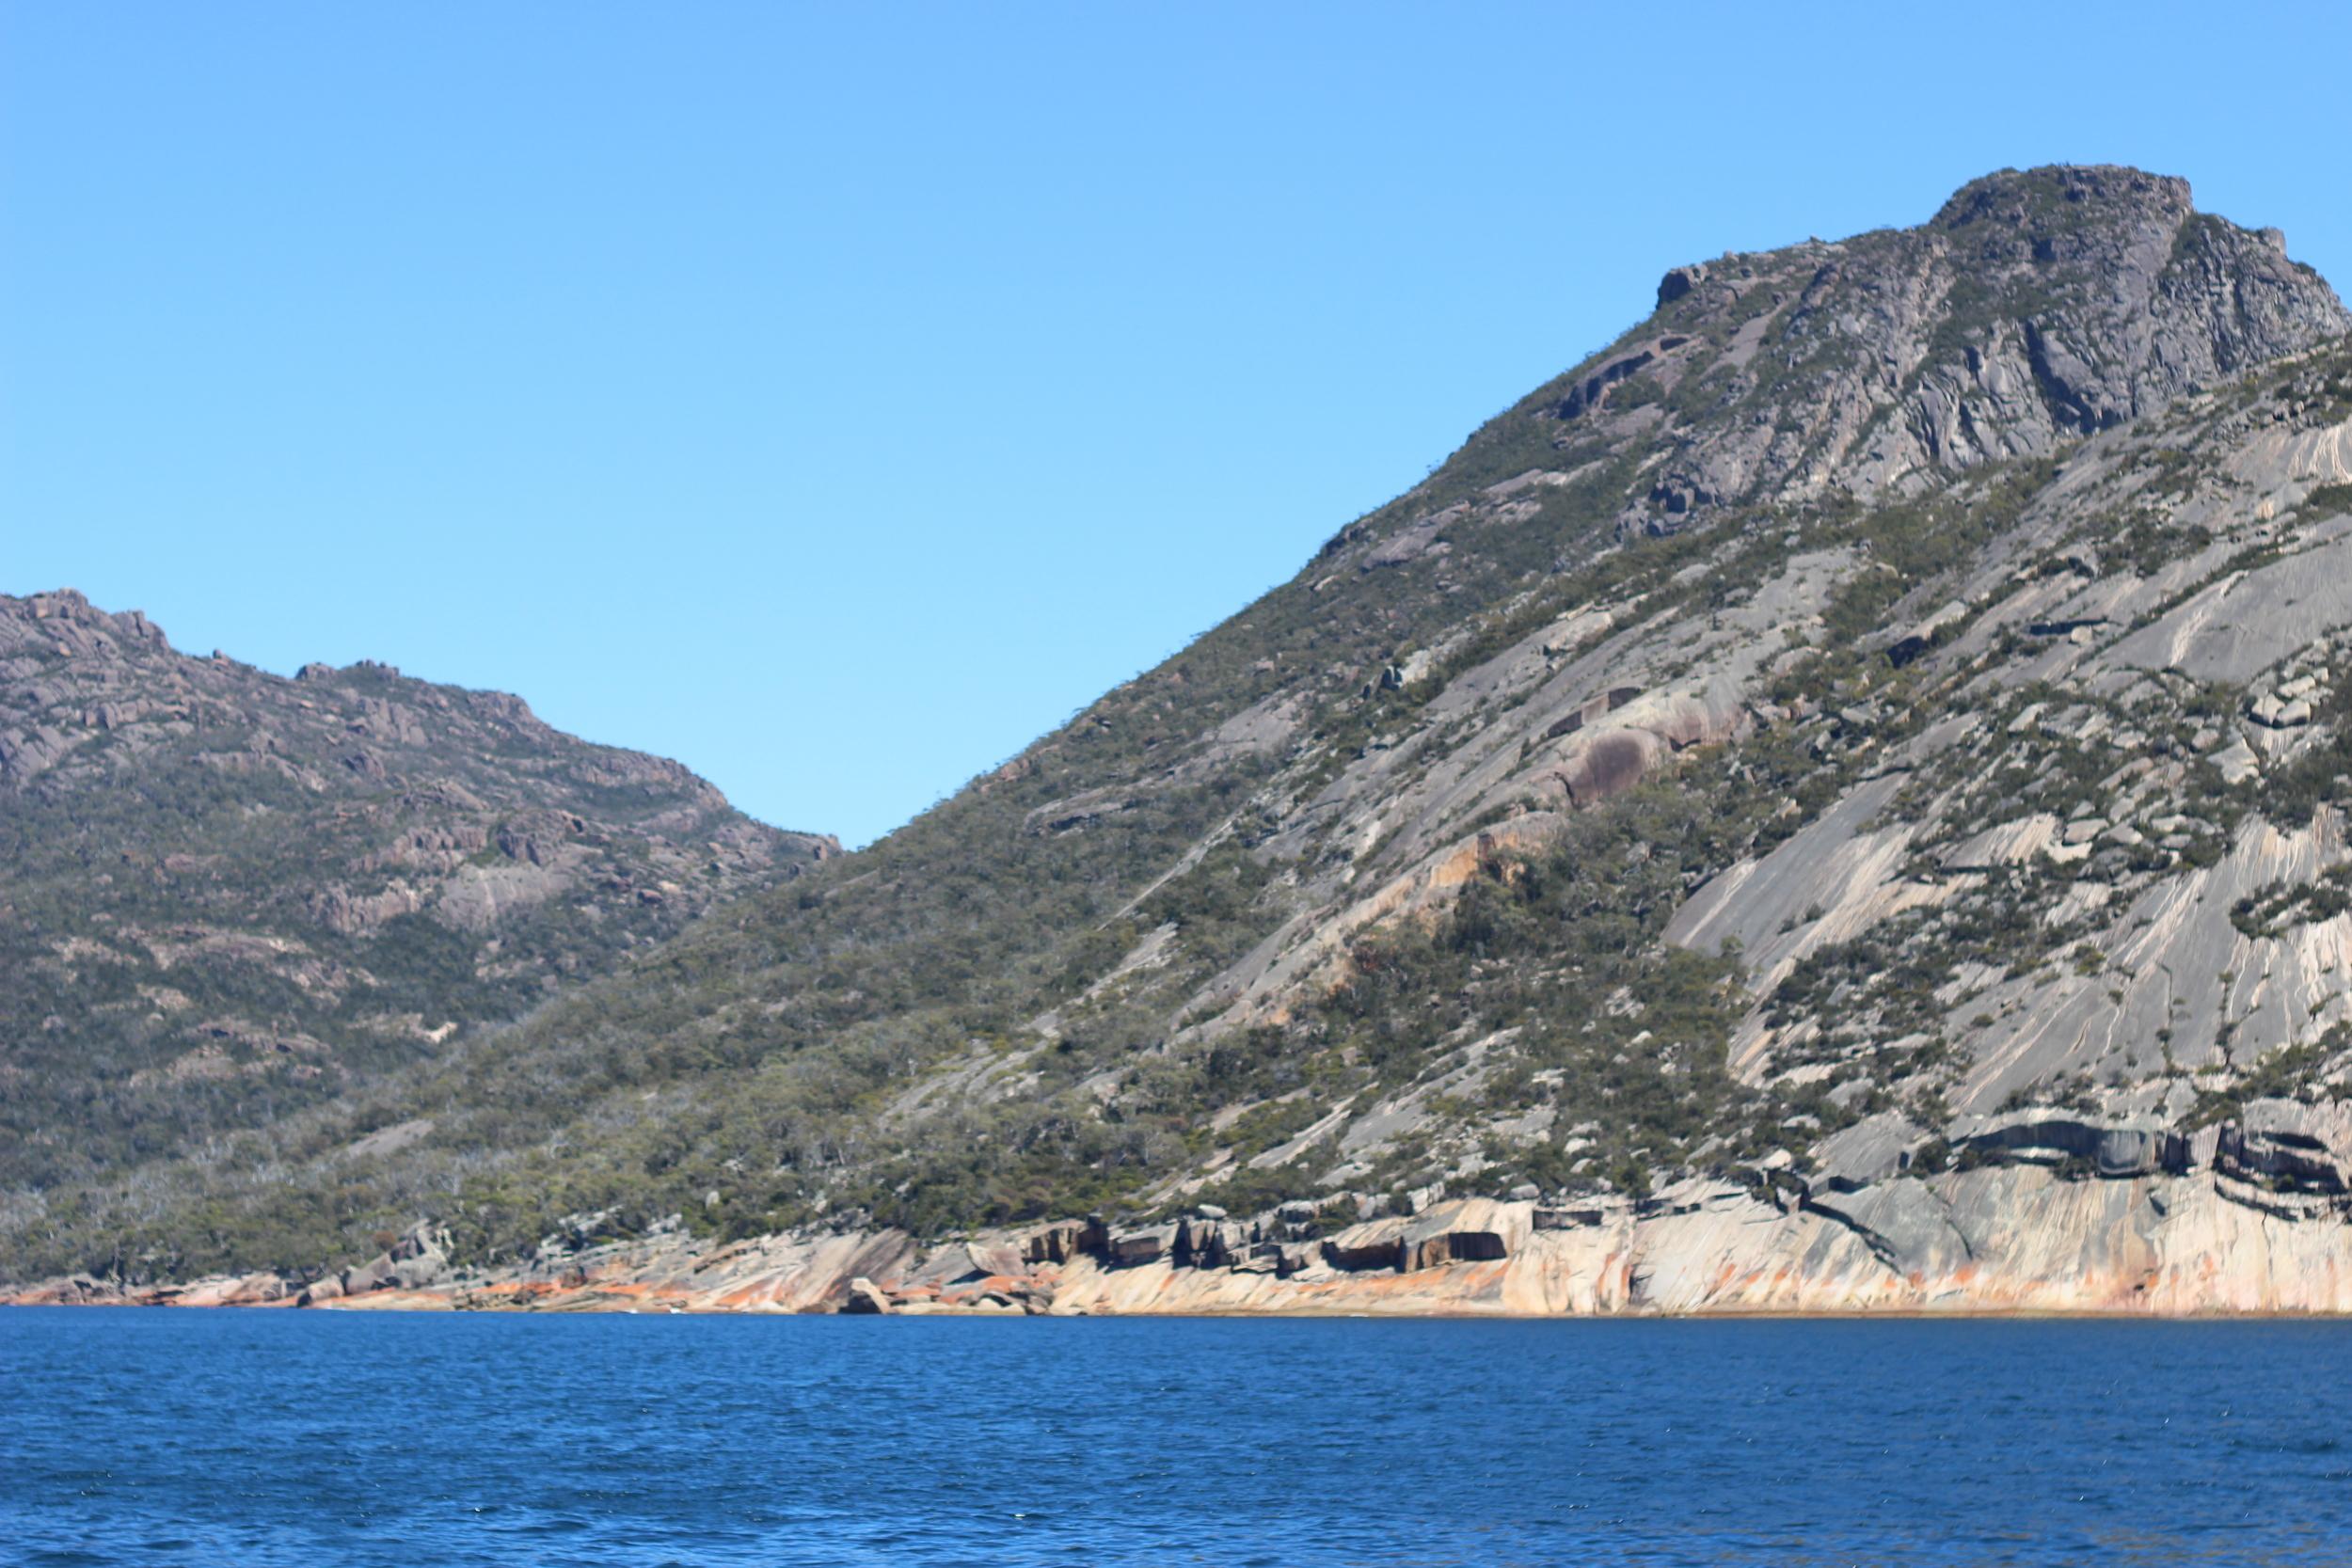 The Granite rocks of the Mount Amos, the Hazard Ranges.